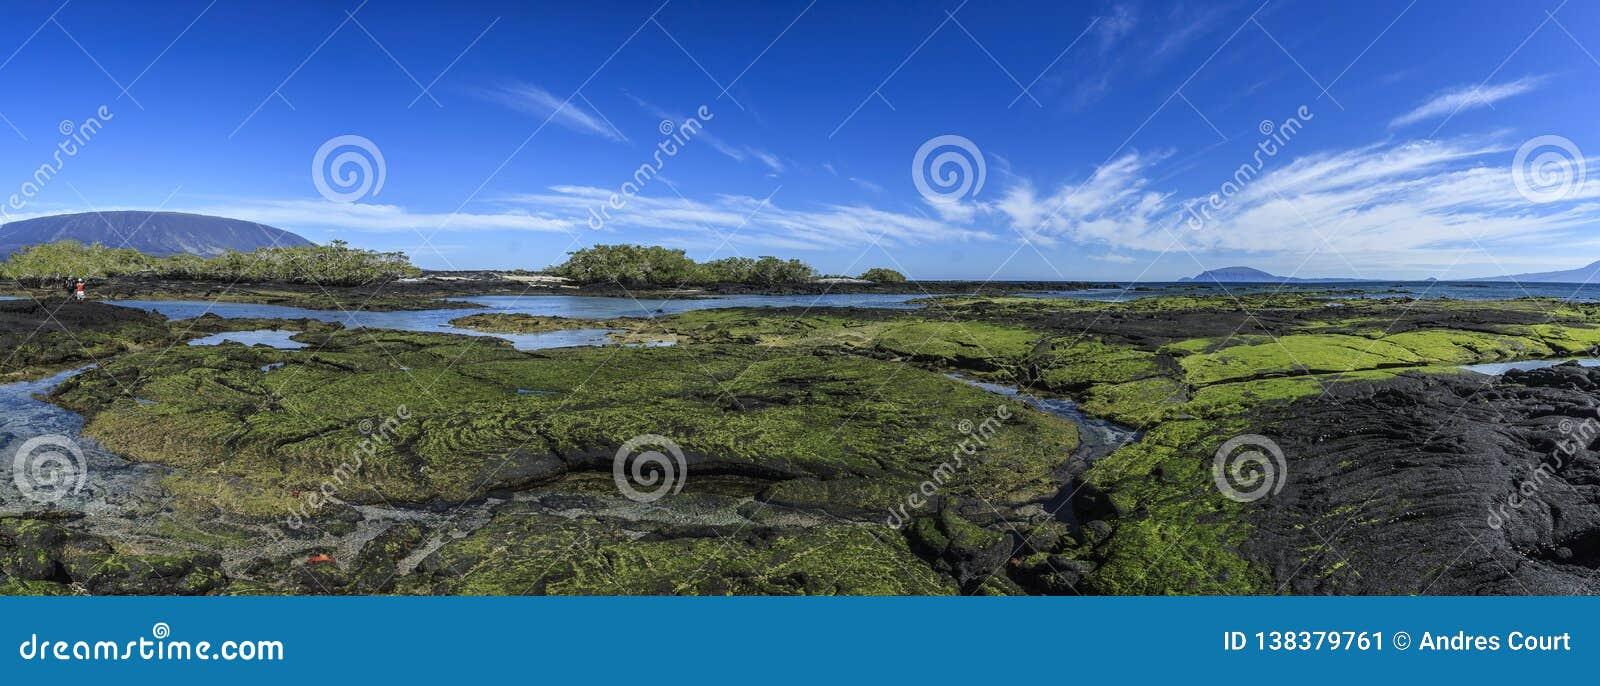 Fernandina landscapes galapagos islands